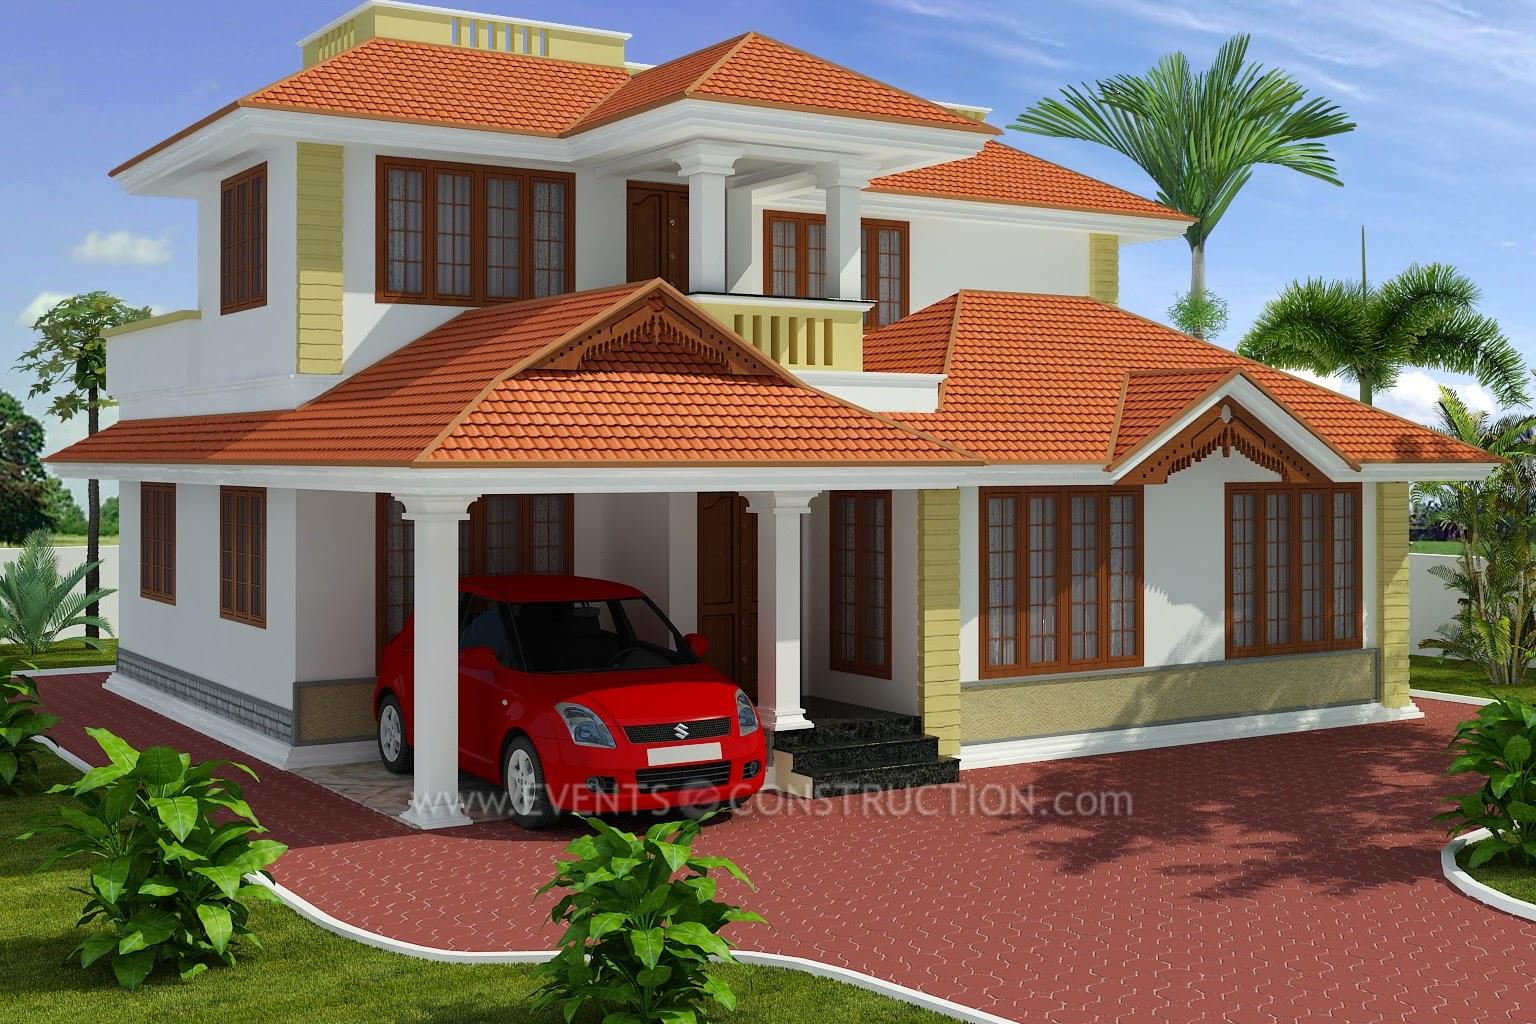 Evens Construction Pvt Ltd: 2401 Square Feet Nice House 3D